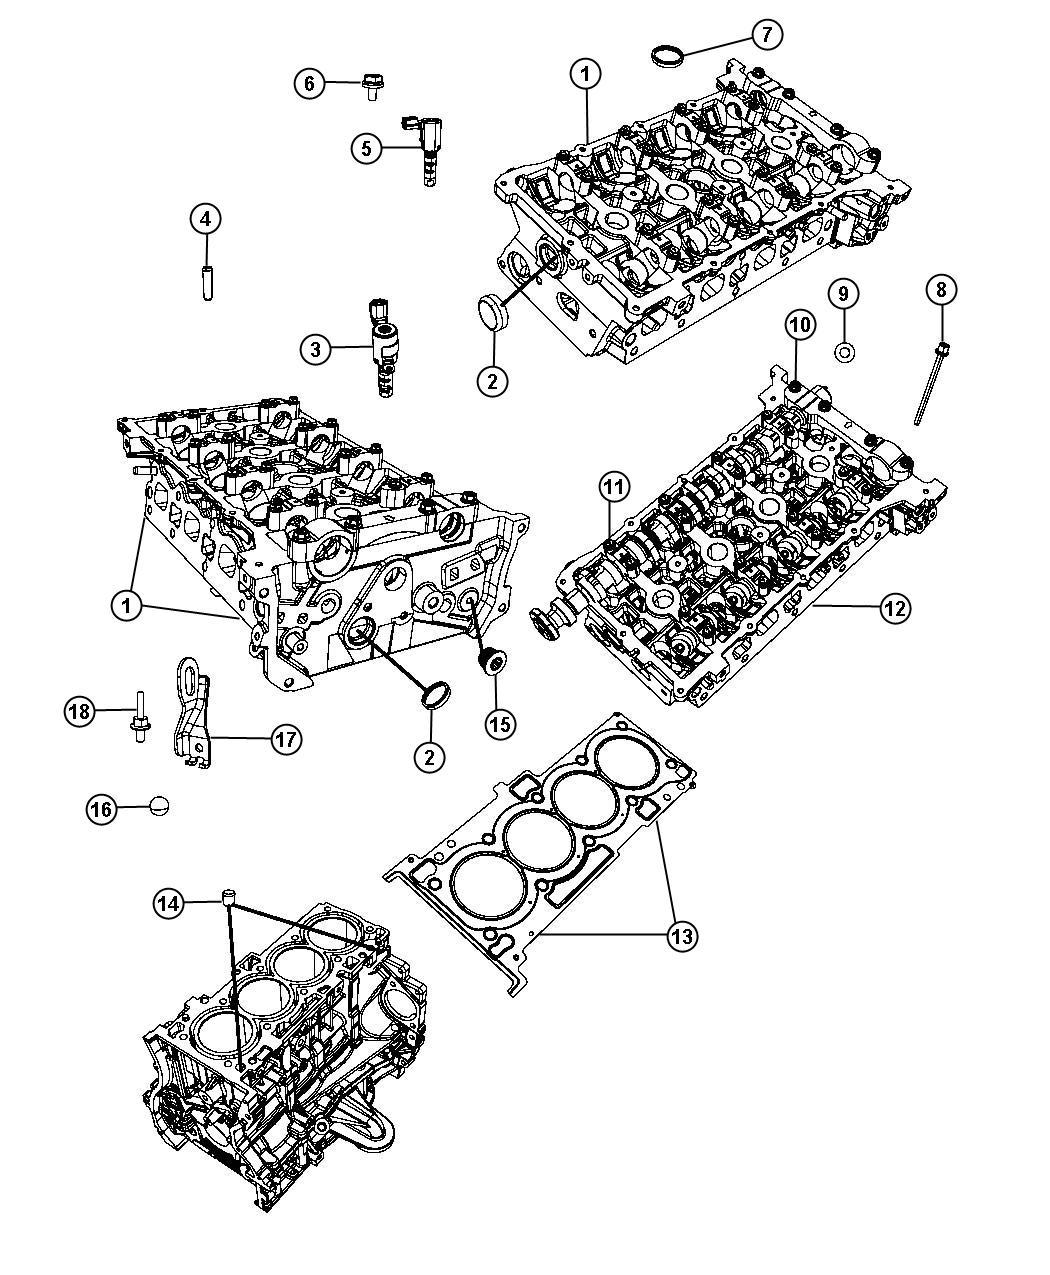 Chrysler 200 Control valve, solenoid. Oil intake, variable